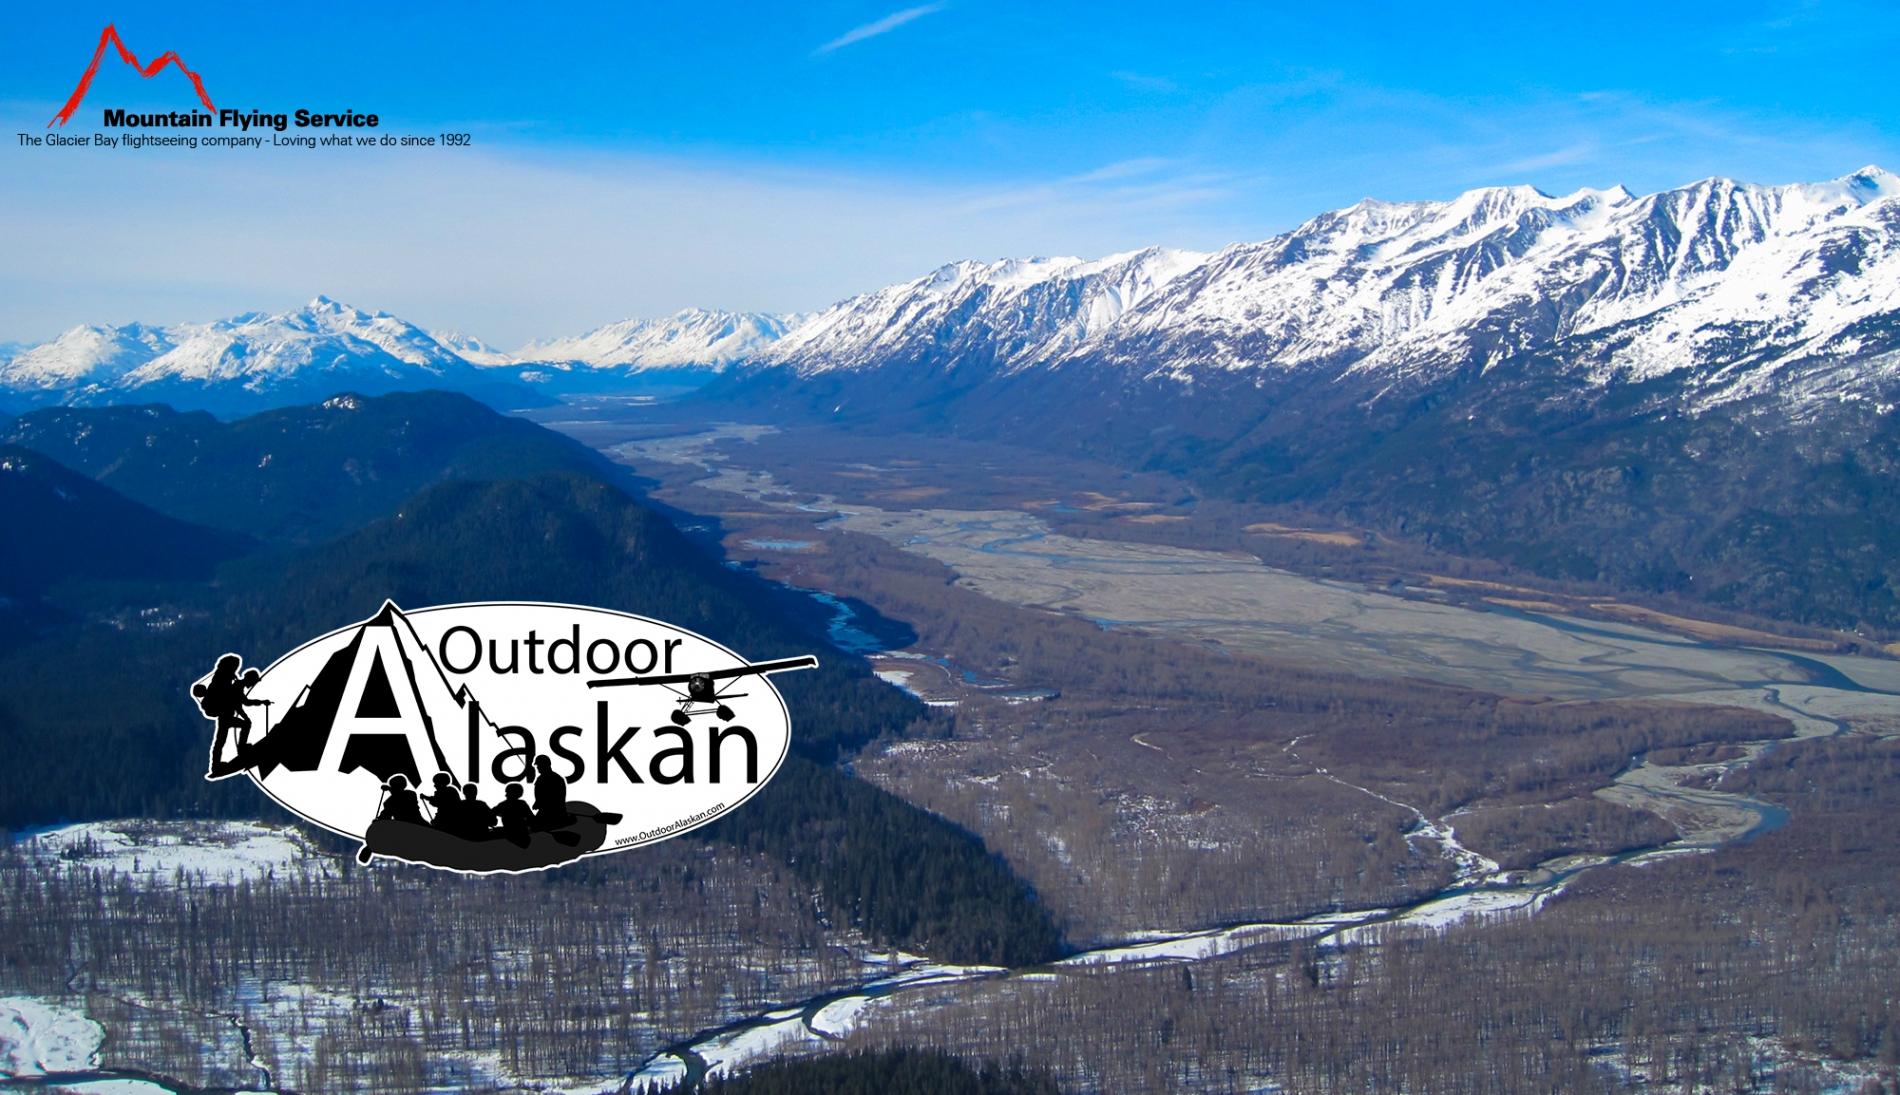 L Bu Qqwqzgnv J Ppoy Vzom Qev on Alaska Tlingit Tribe Map